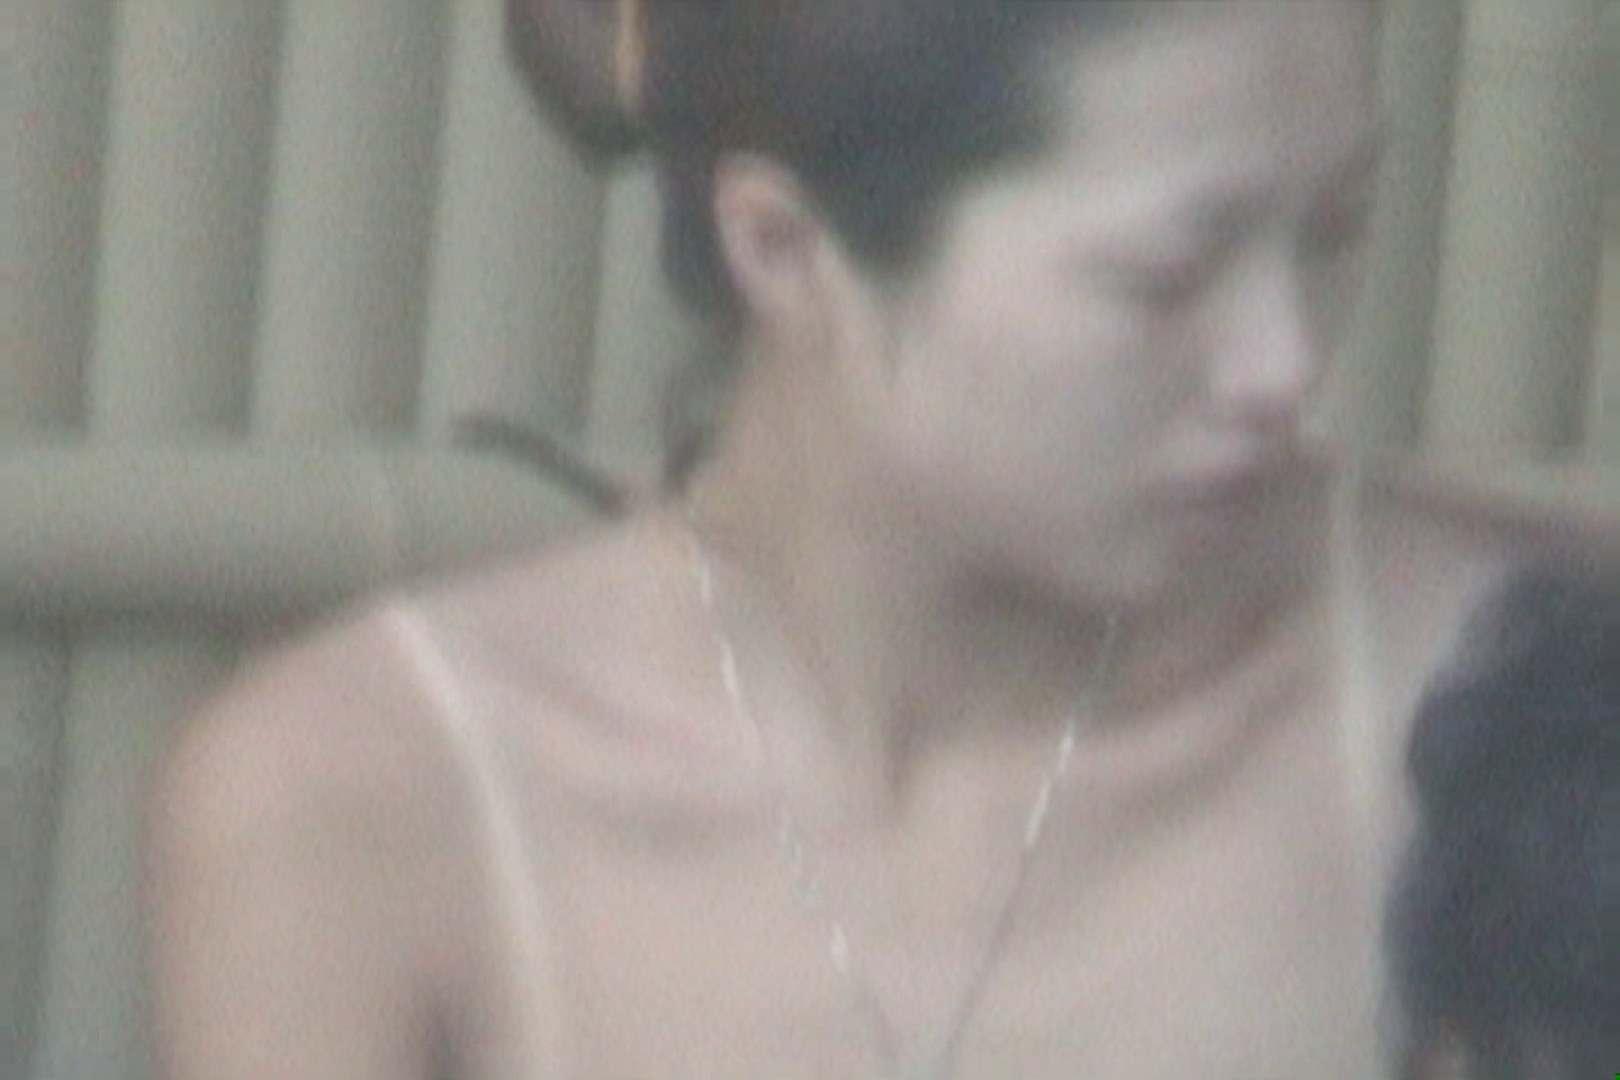 Aquaな露天風呂Vol.571 美しいOLの裸体 | 露天風呂突入  99pic 22